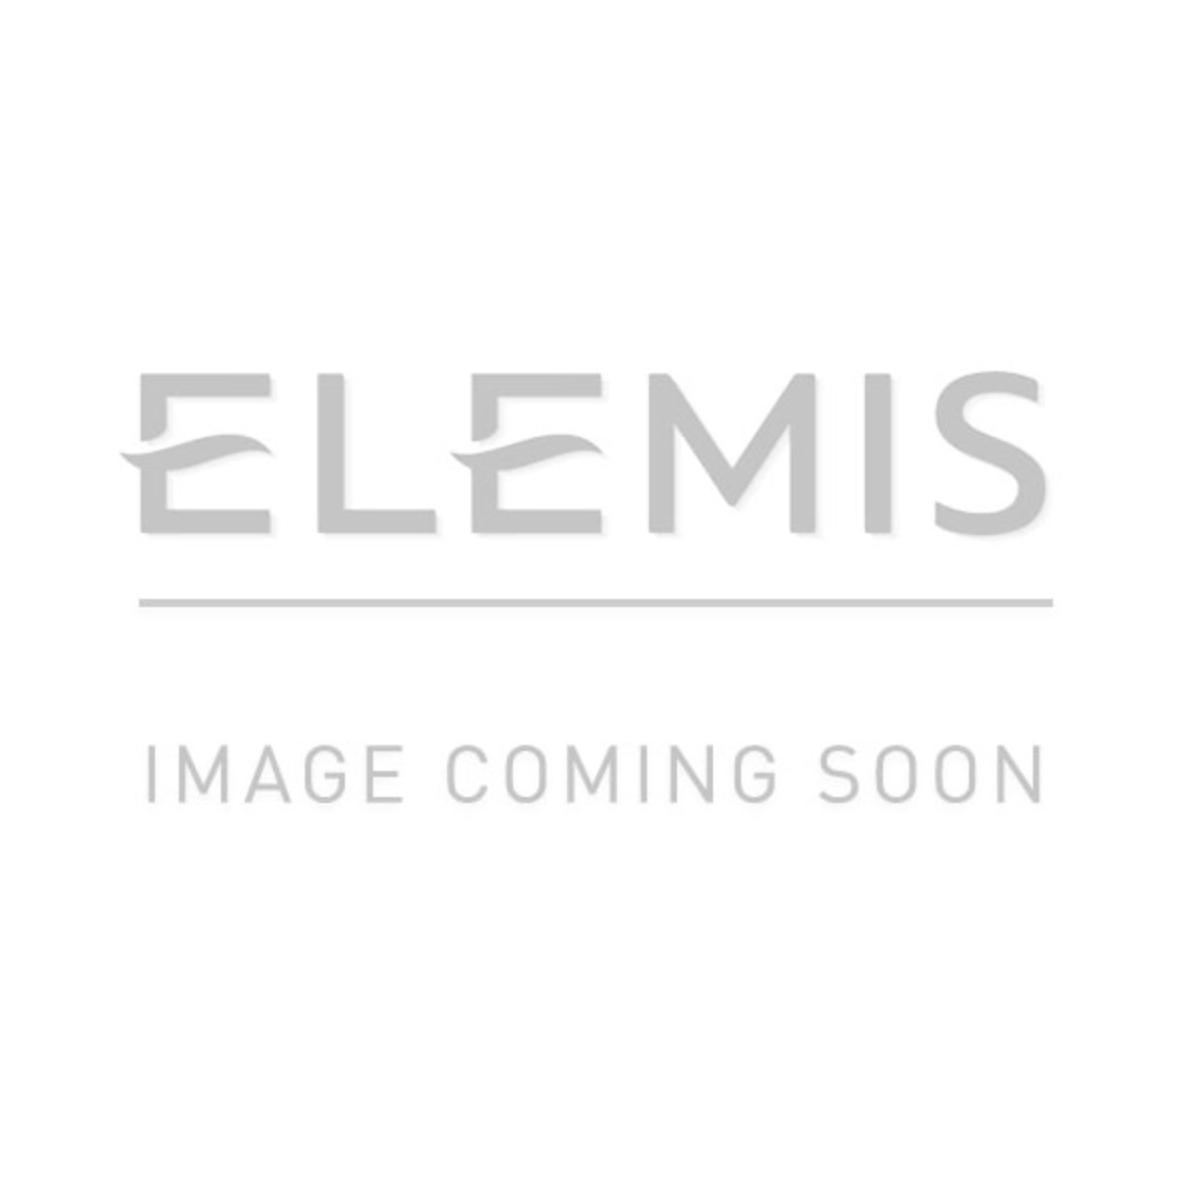 Elemis - Elemis shower gel ...